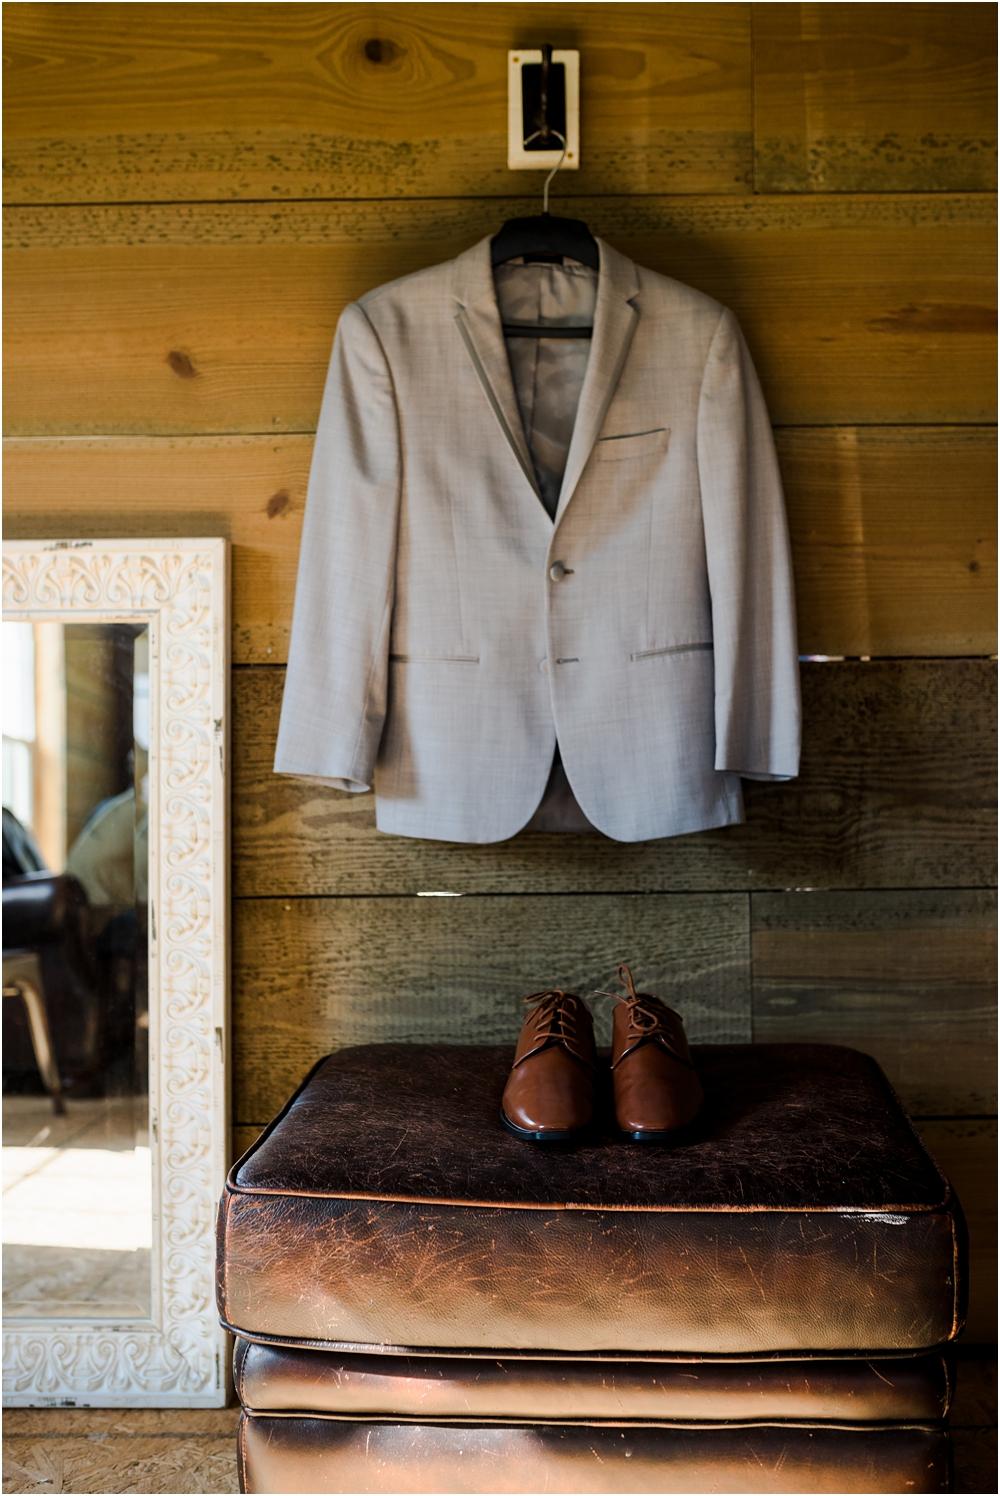 mosley-wedding-kiersten-stevenson-photography-30a-panama-city-beach-dothan-tallahassee-(61-of-472).JPG